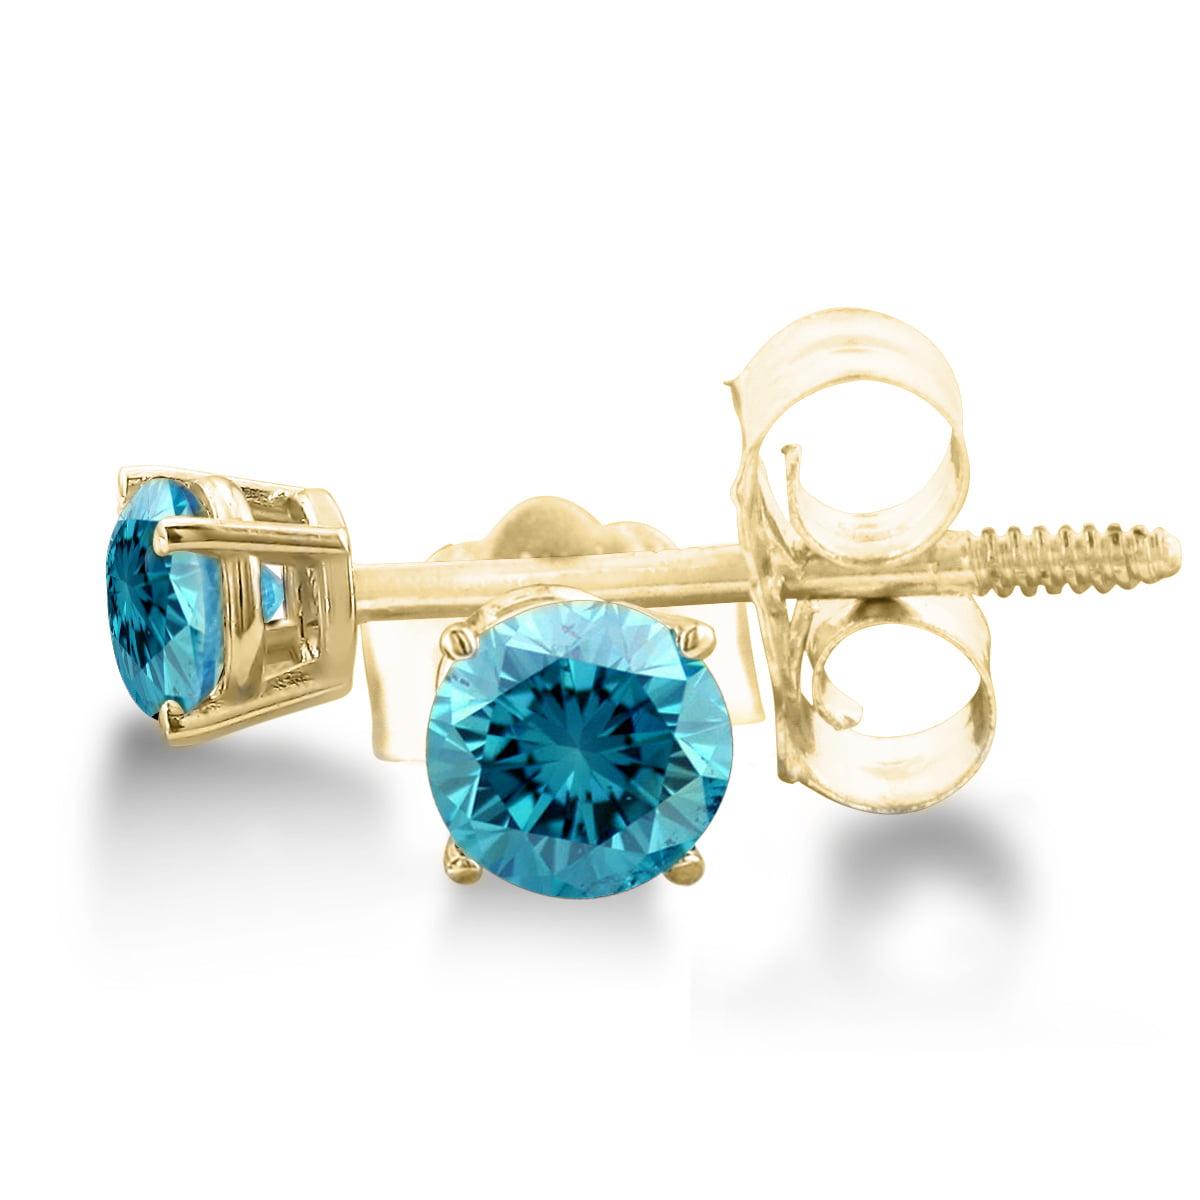 14K Yellow Gold Blue Diamond Stud Earrings 1/4ct tw